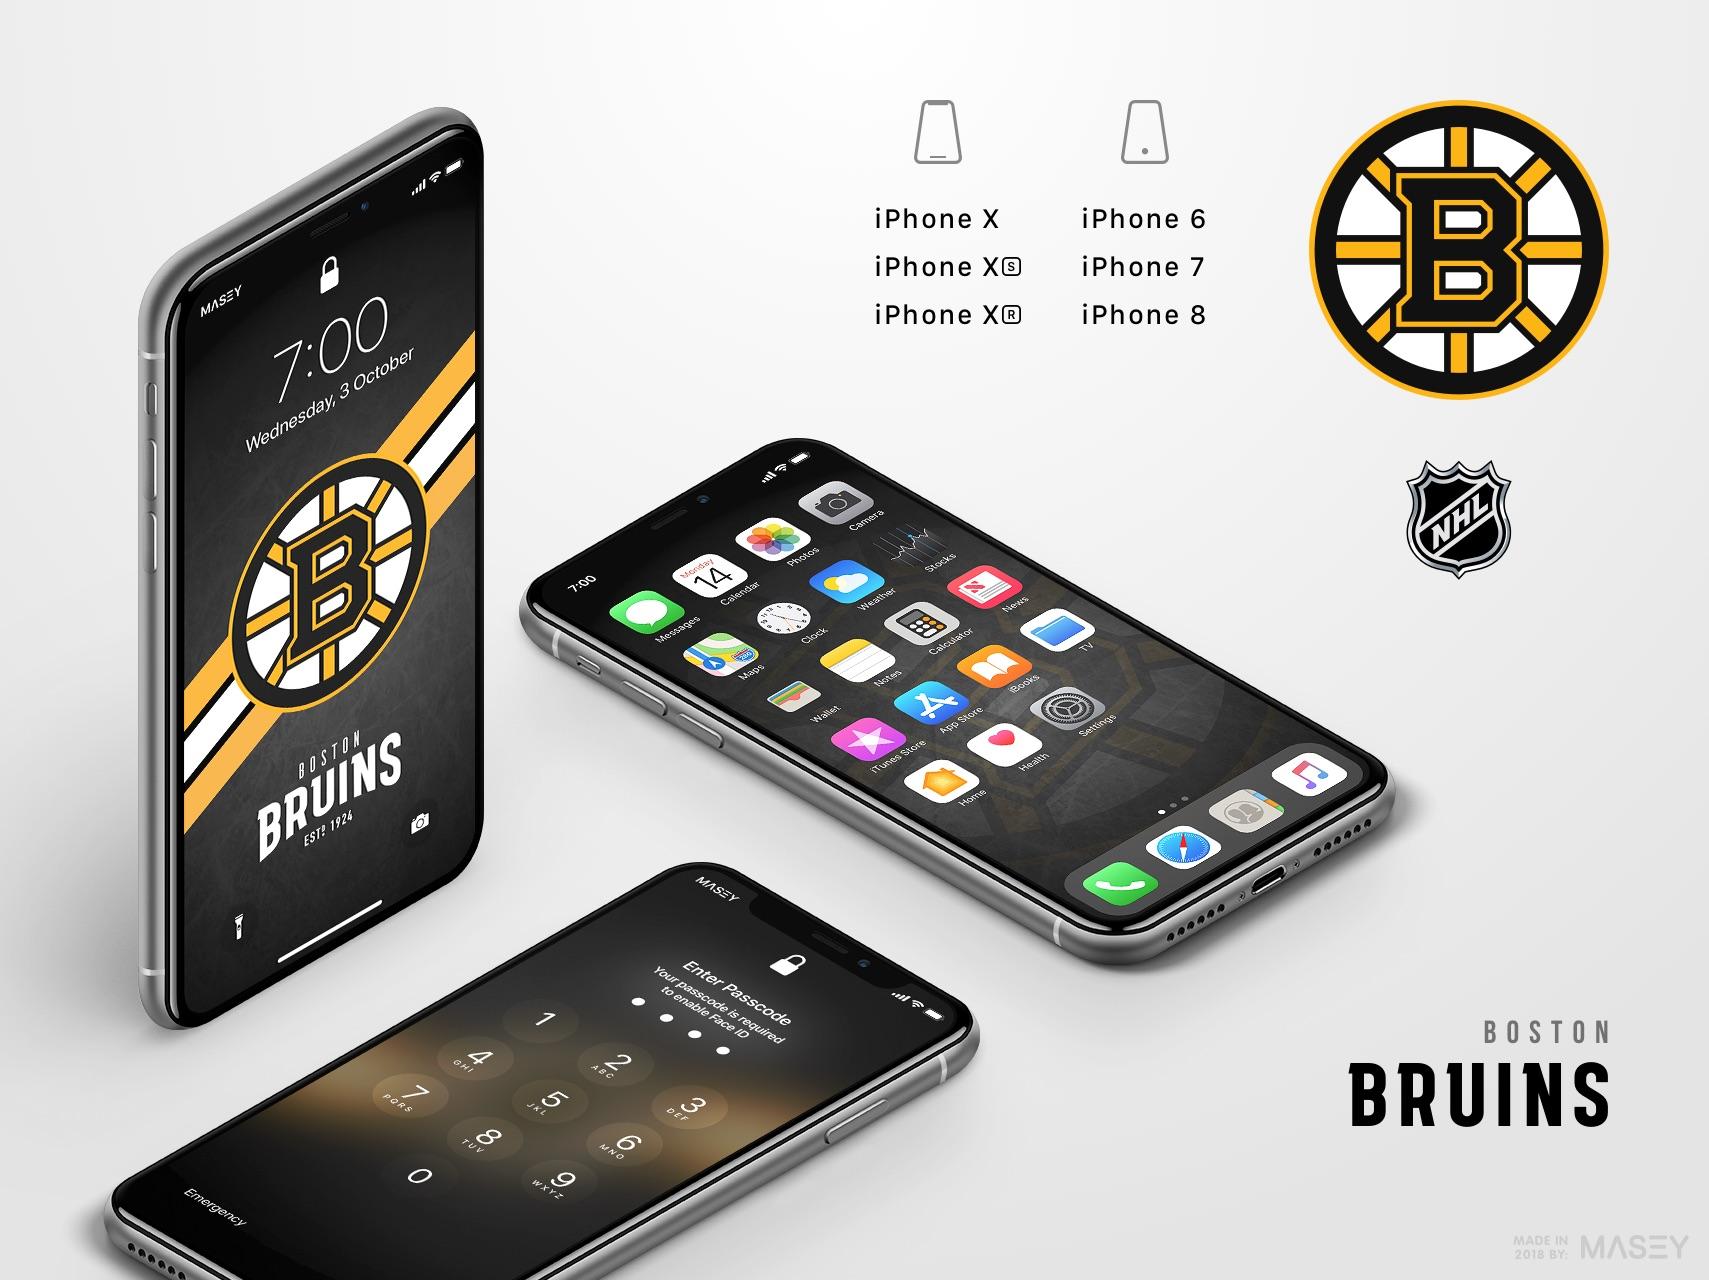 Boston Bruins iPhone Wallpaper